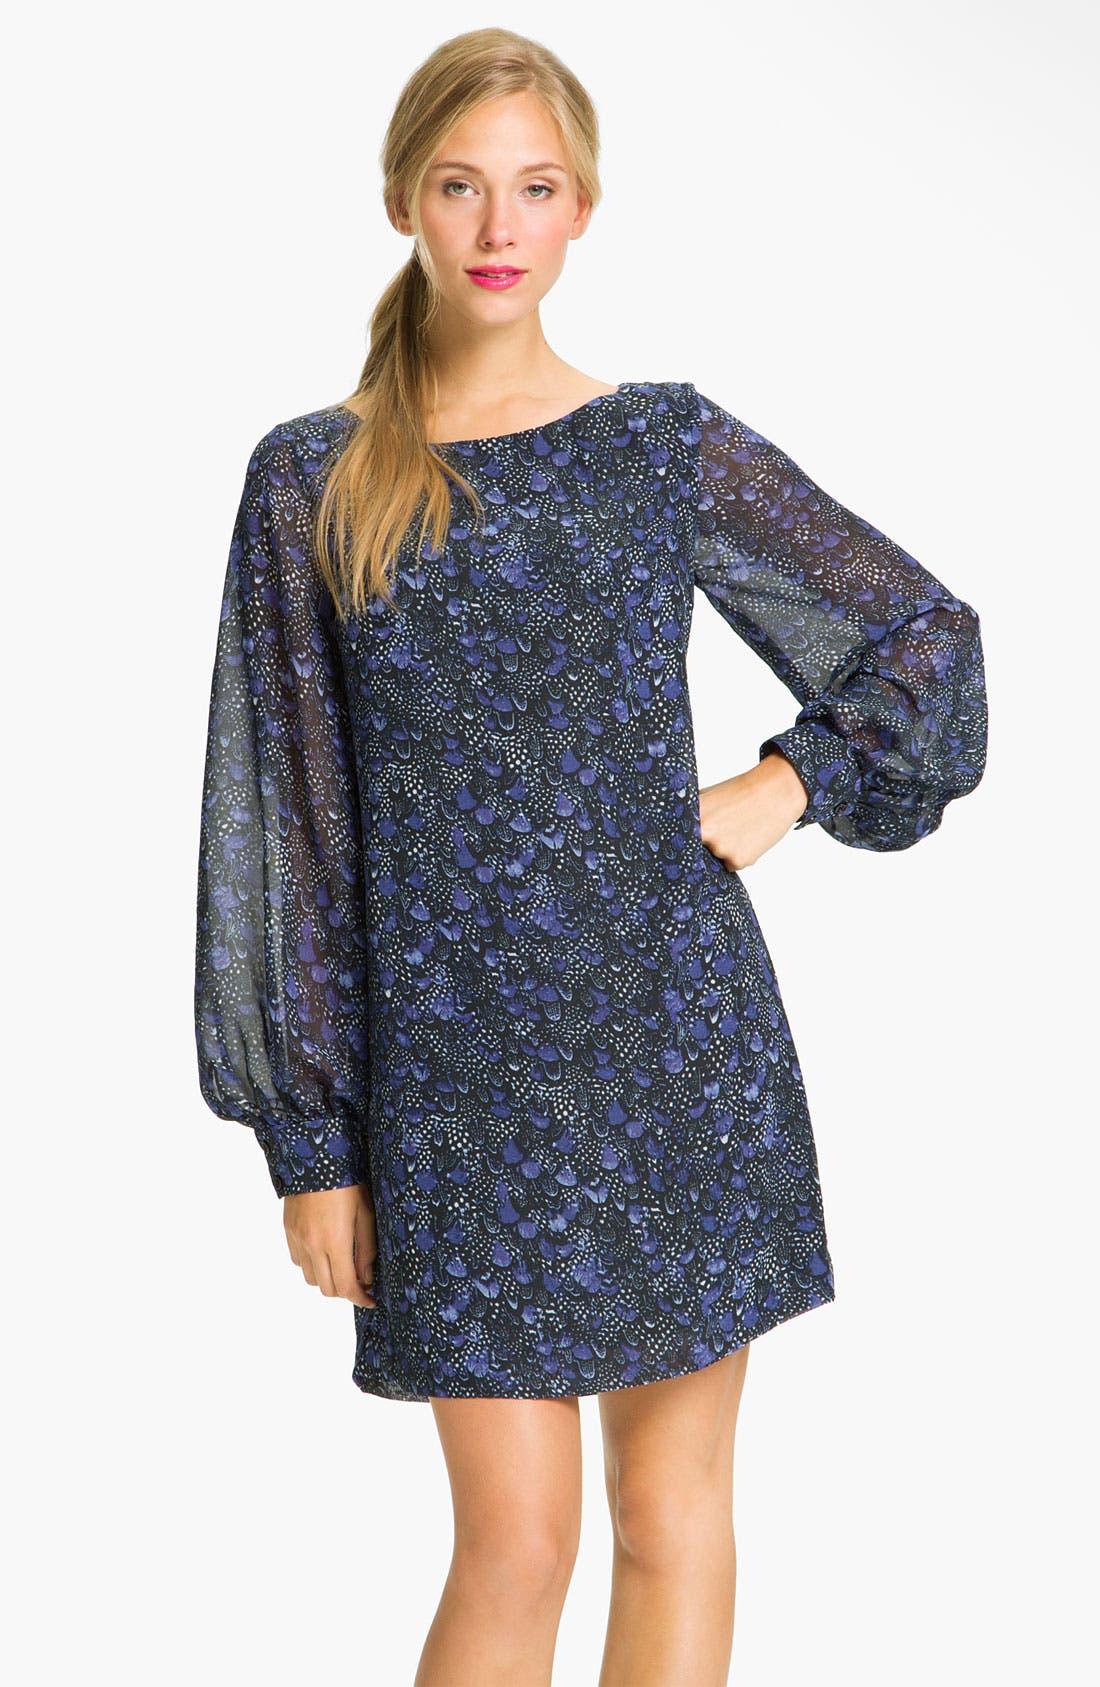 Alternate Image 1 Selected - Donna Morgan Sheer Blouson Sleeve Shift Dress